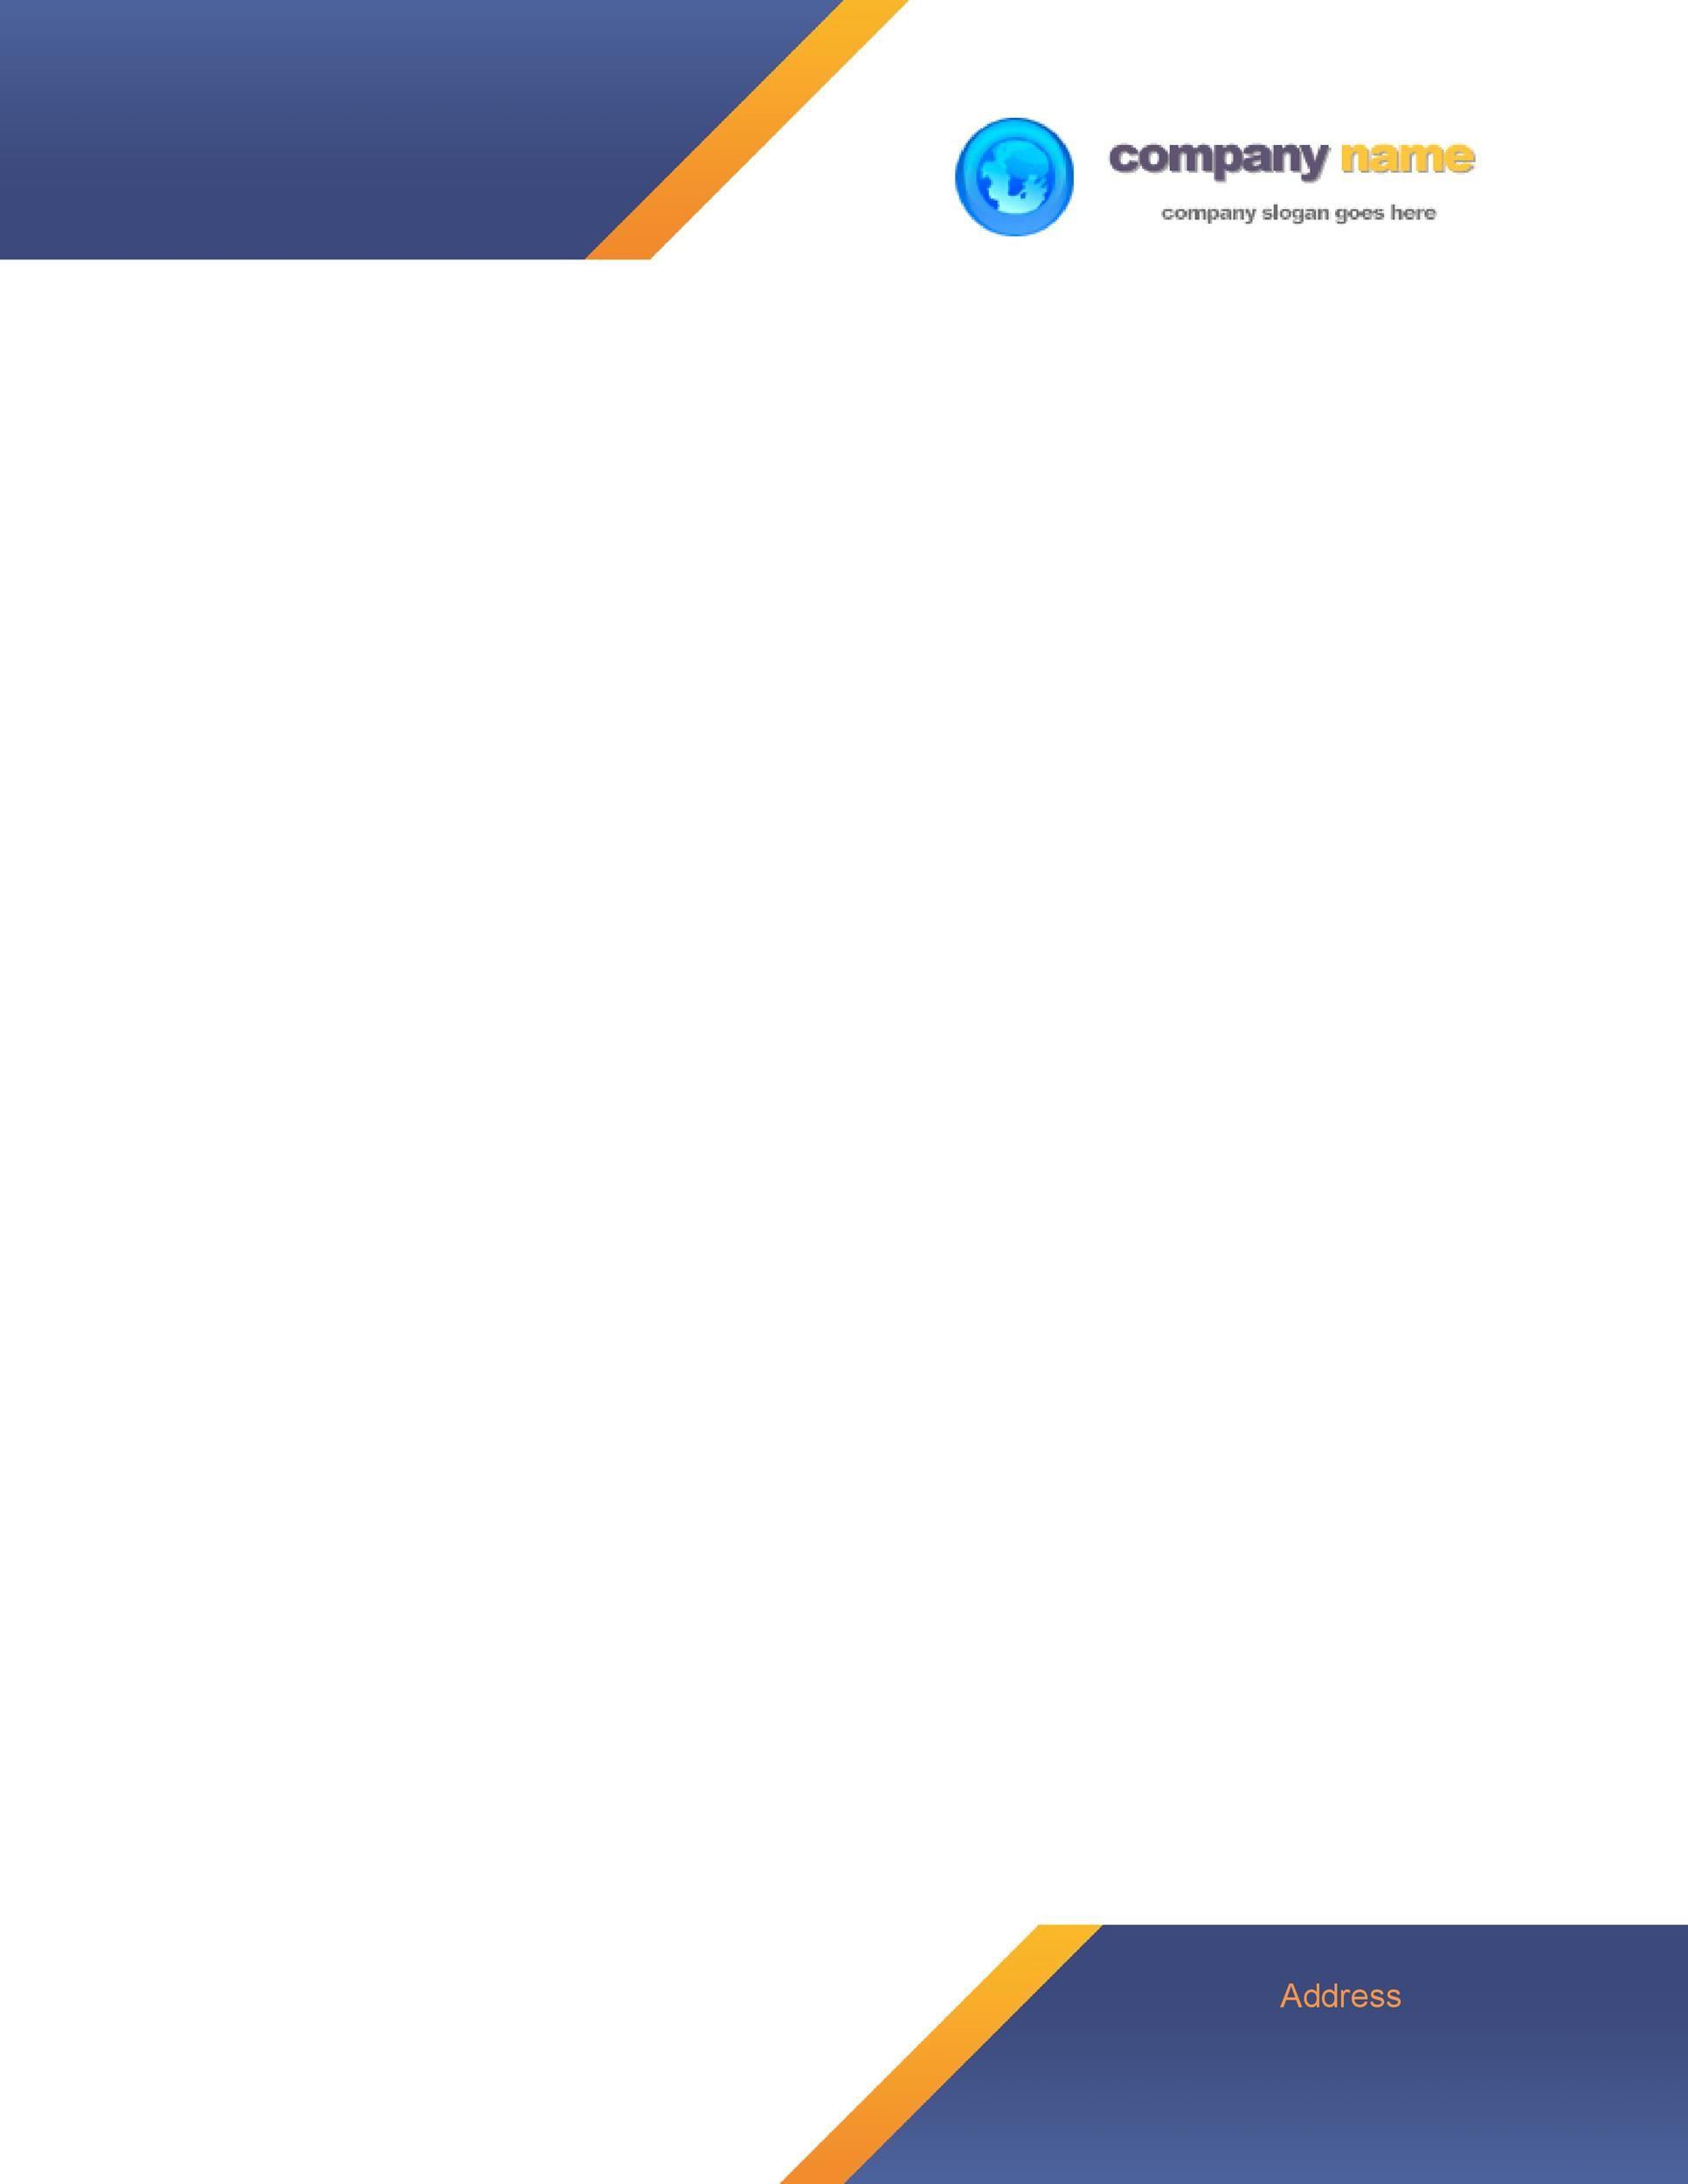 007 Unbelievable Letterhead Format In Word Free Download Pdf High Resolution Full